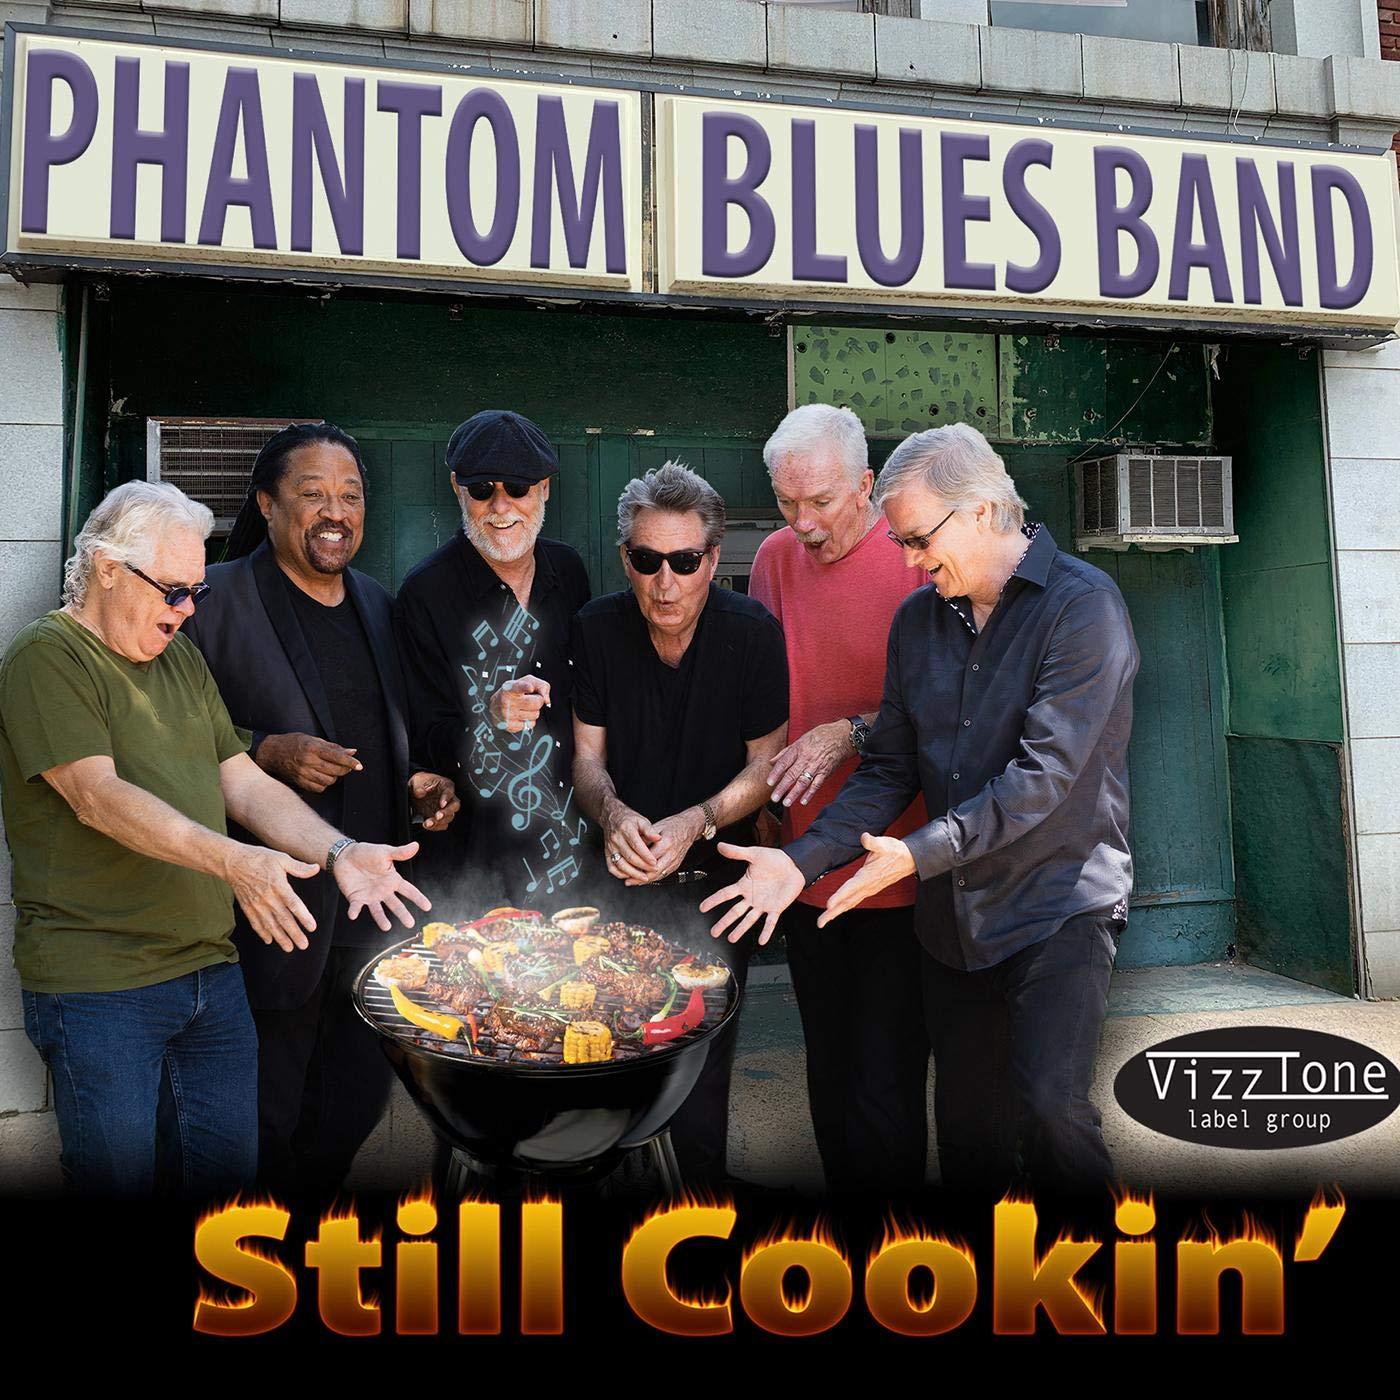 The Phantom Blues Band - Still Cookin